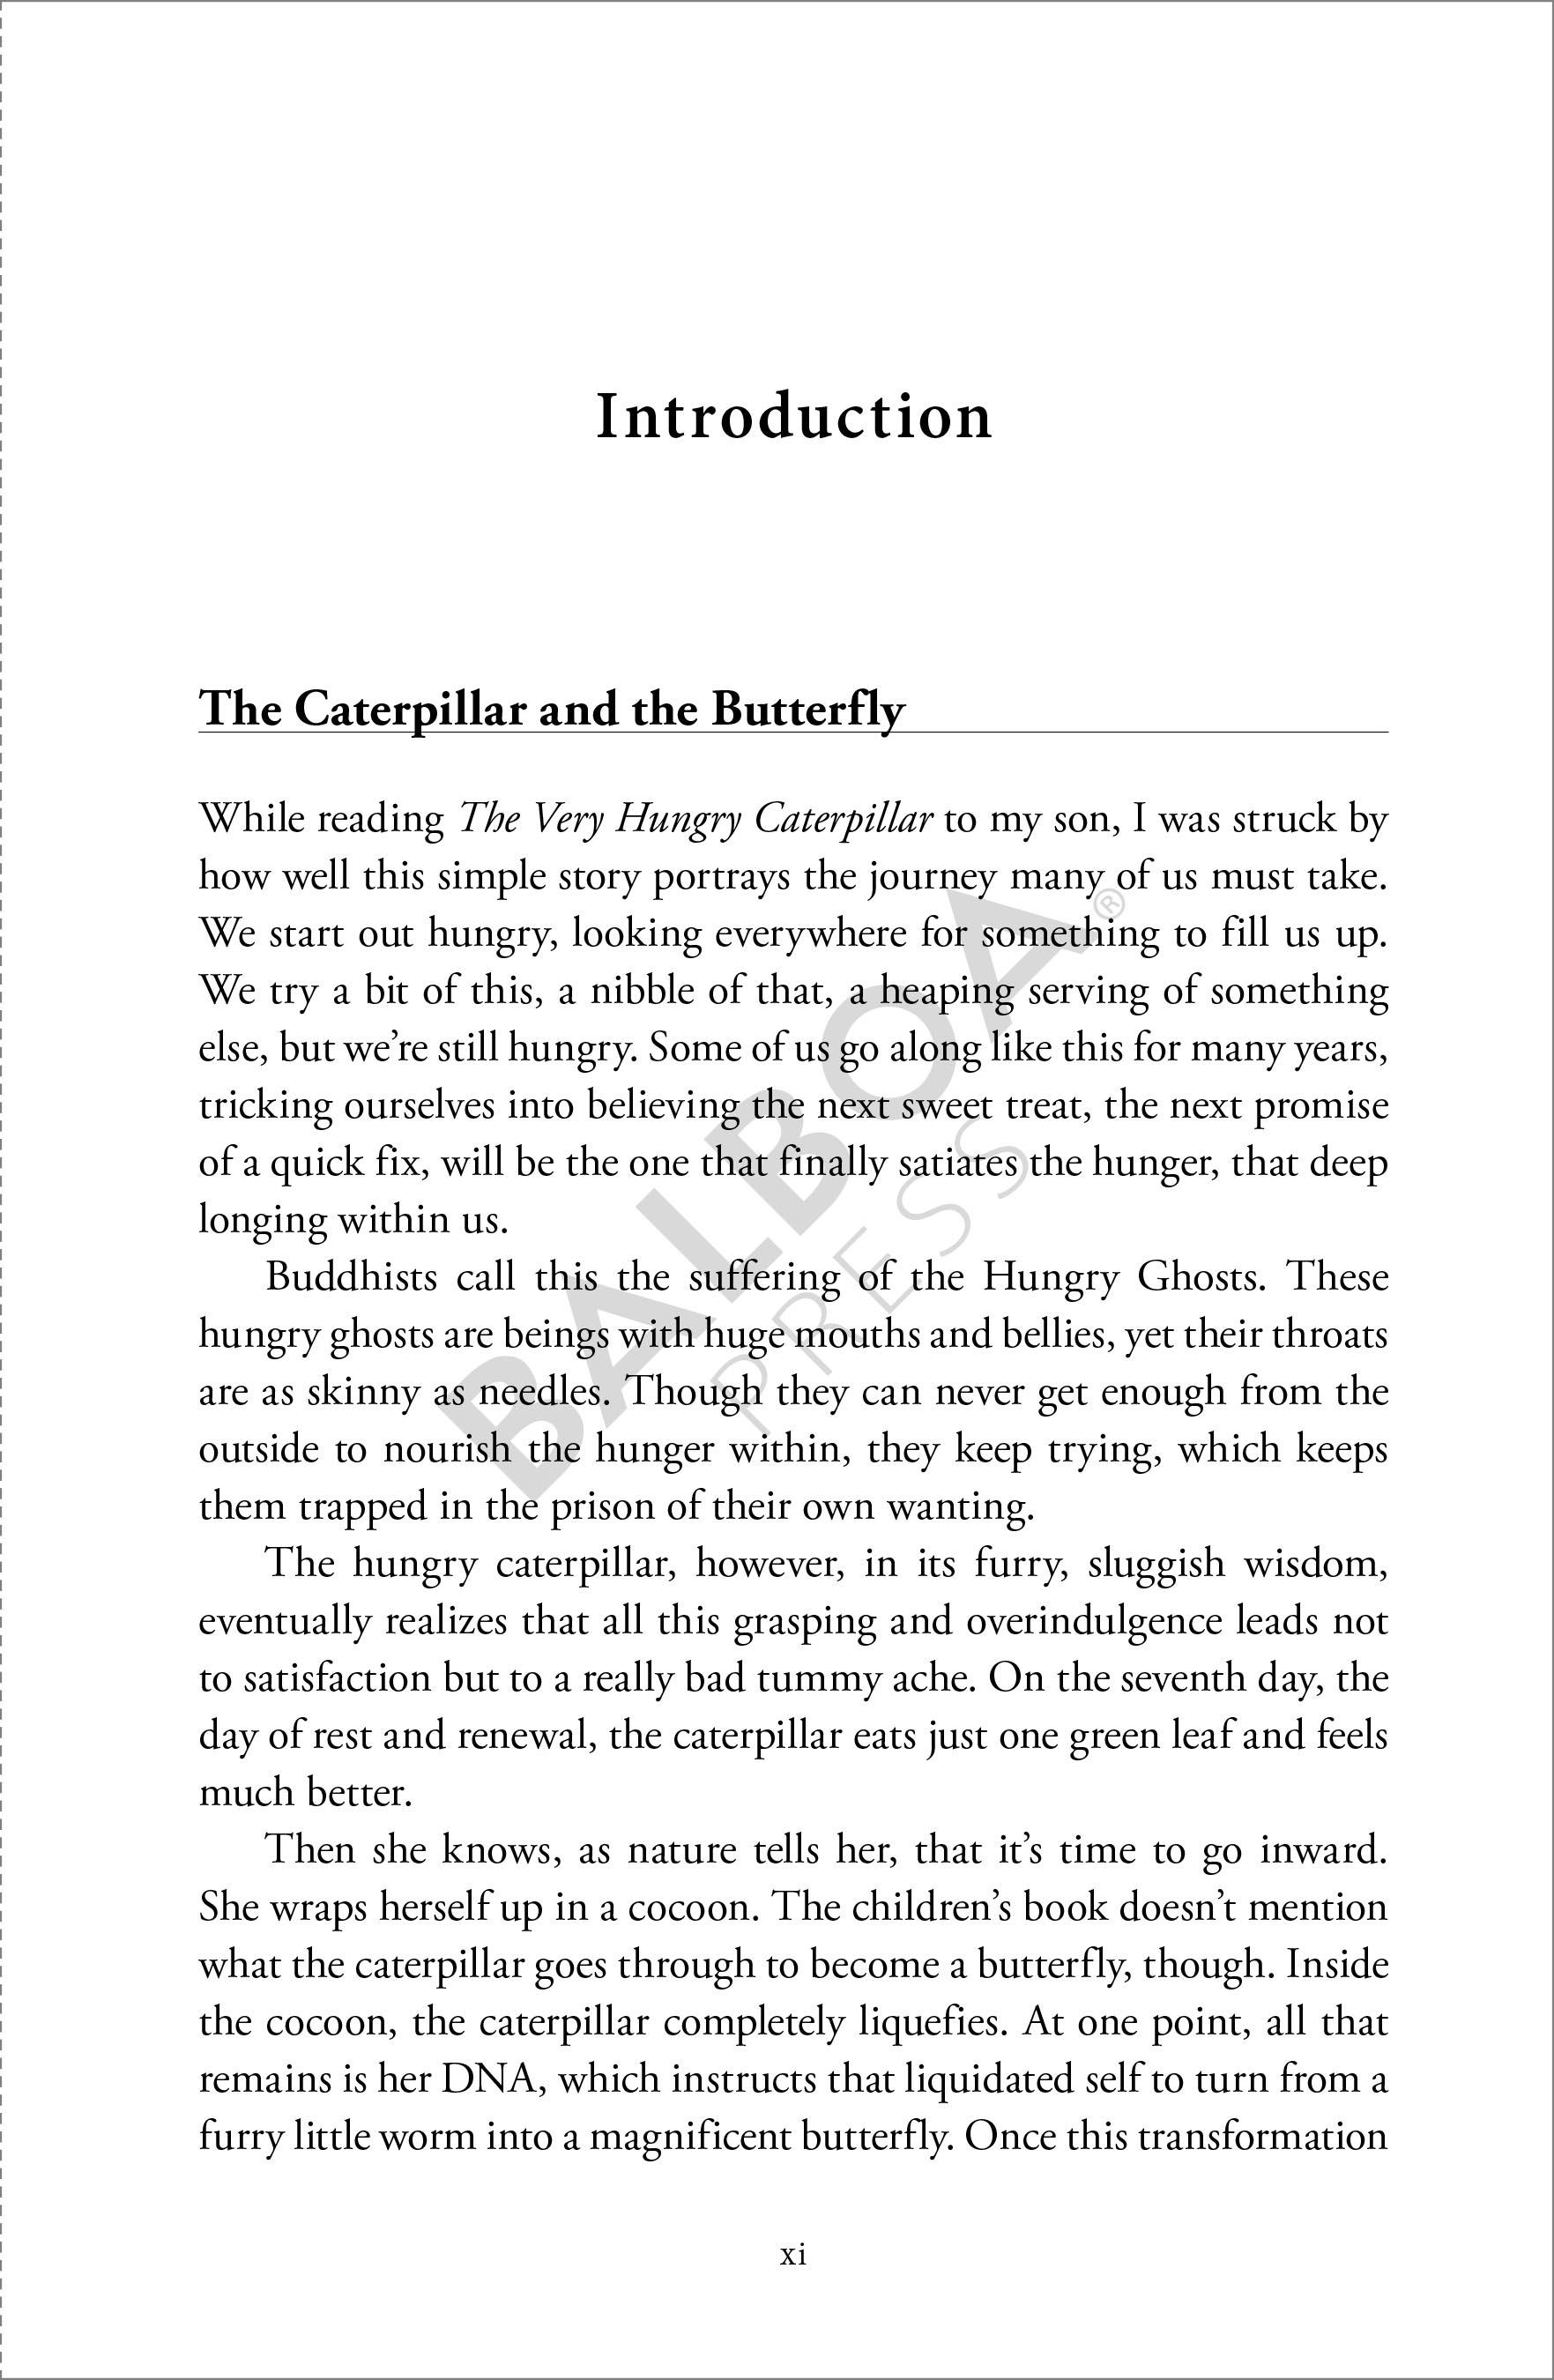 Sample book 9.jpg